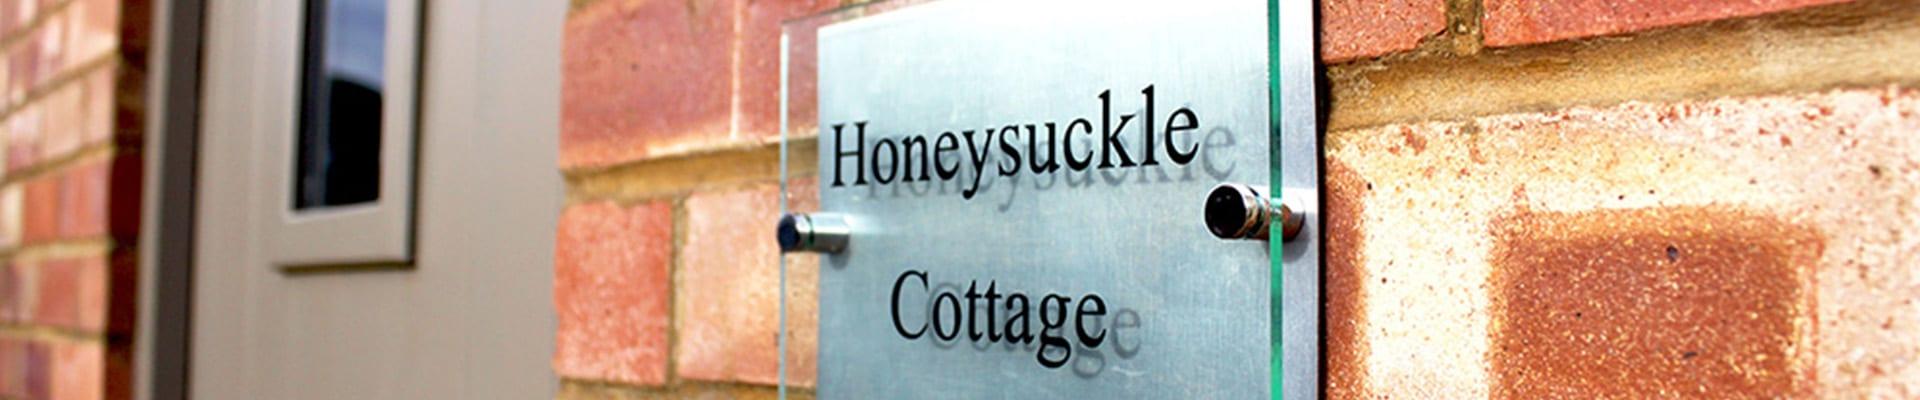 Honeysuckle Cottage Banner